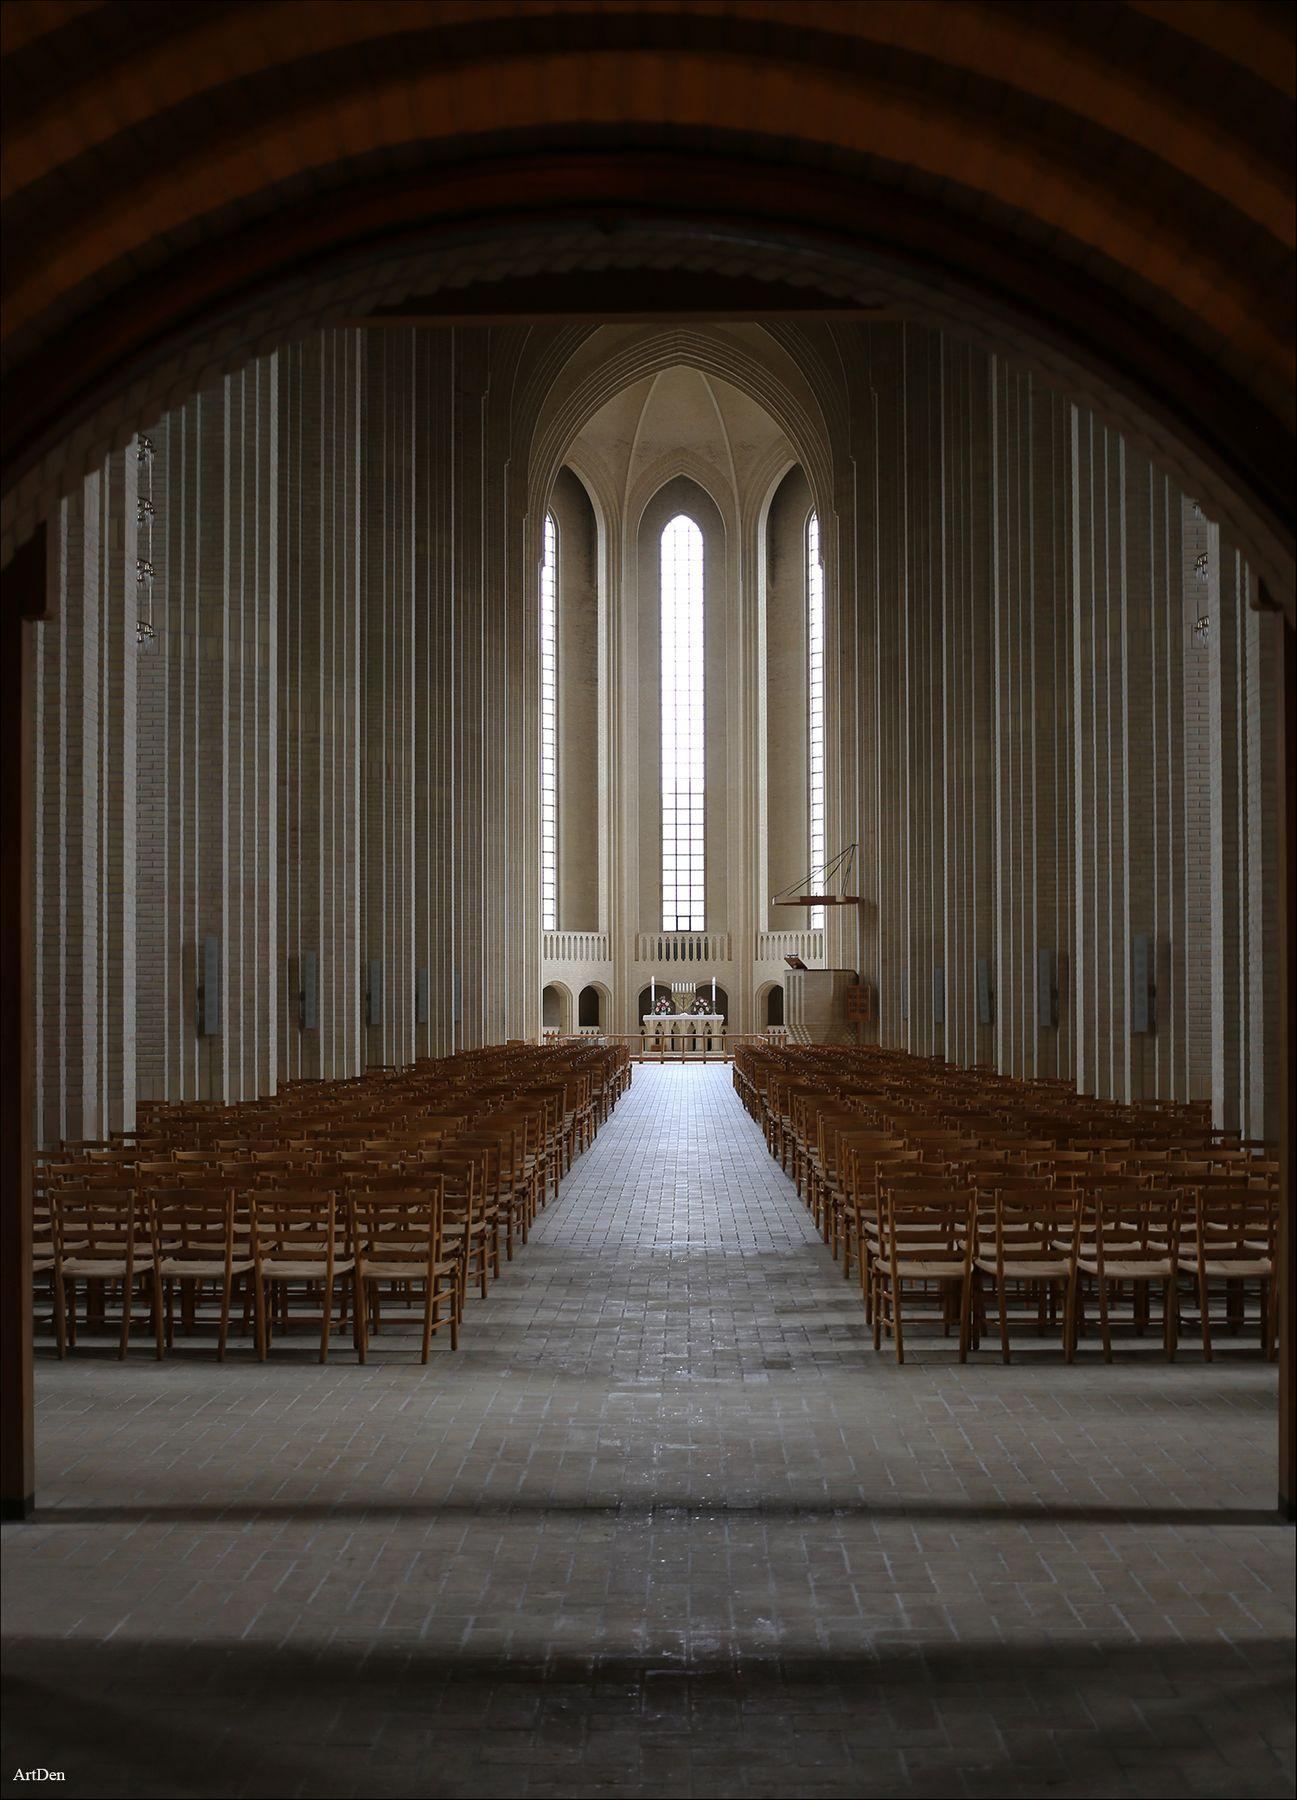 Церковь Грундтвига в Копенгагене Дания Копенгаген Дизайн